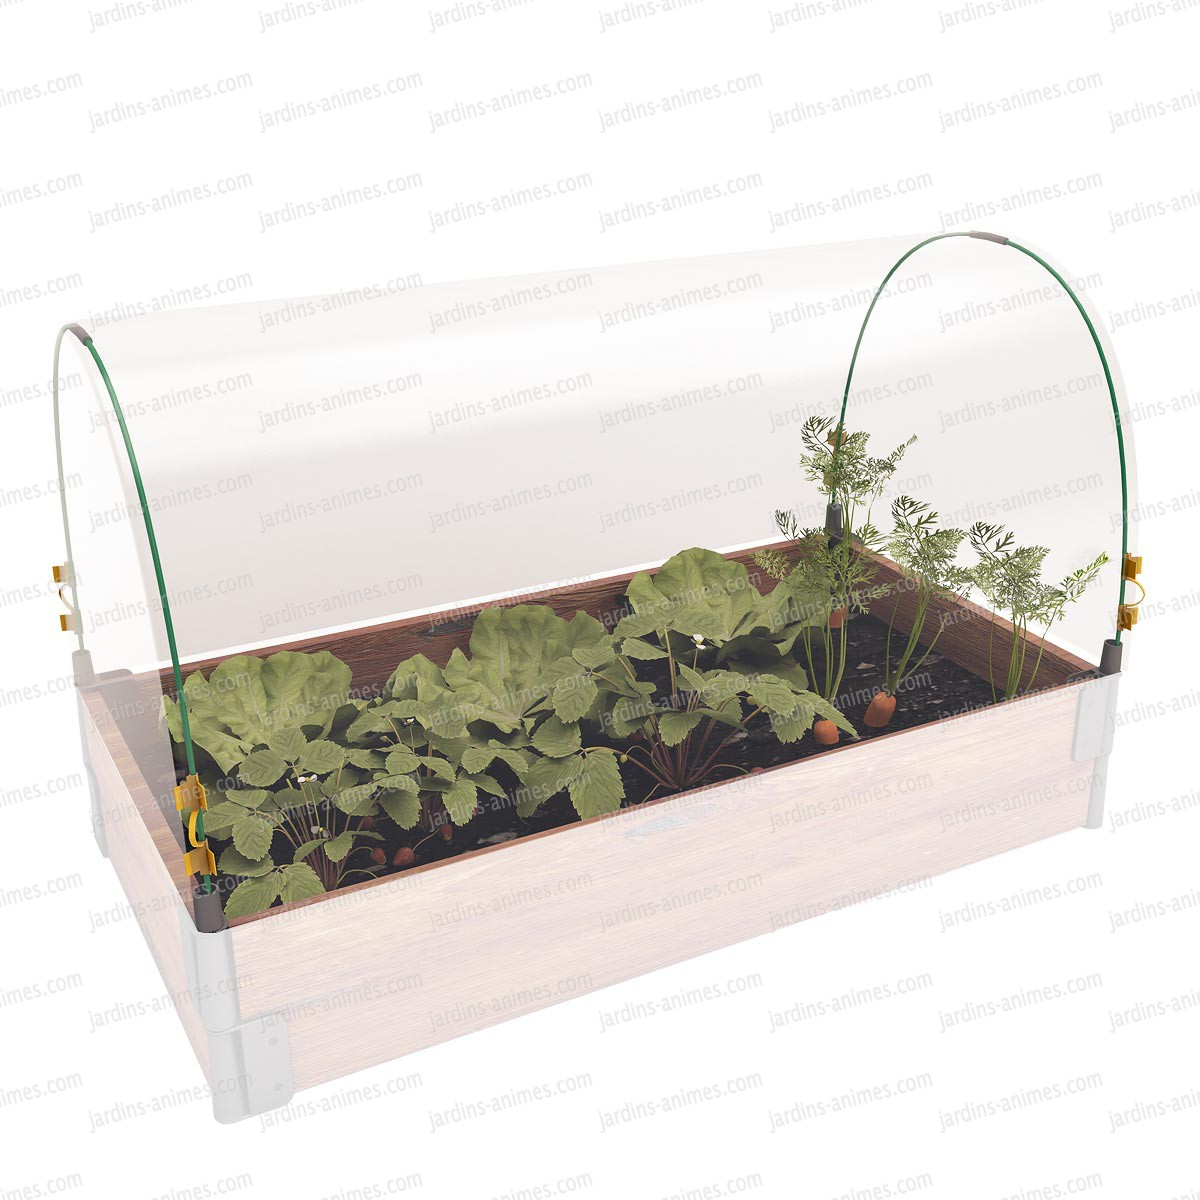 Bache de protection 100x50cm potager jura carr potager - Bache de protection jardin ...